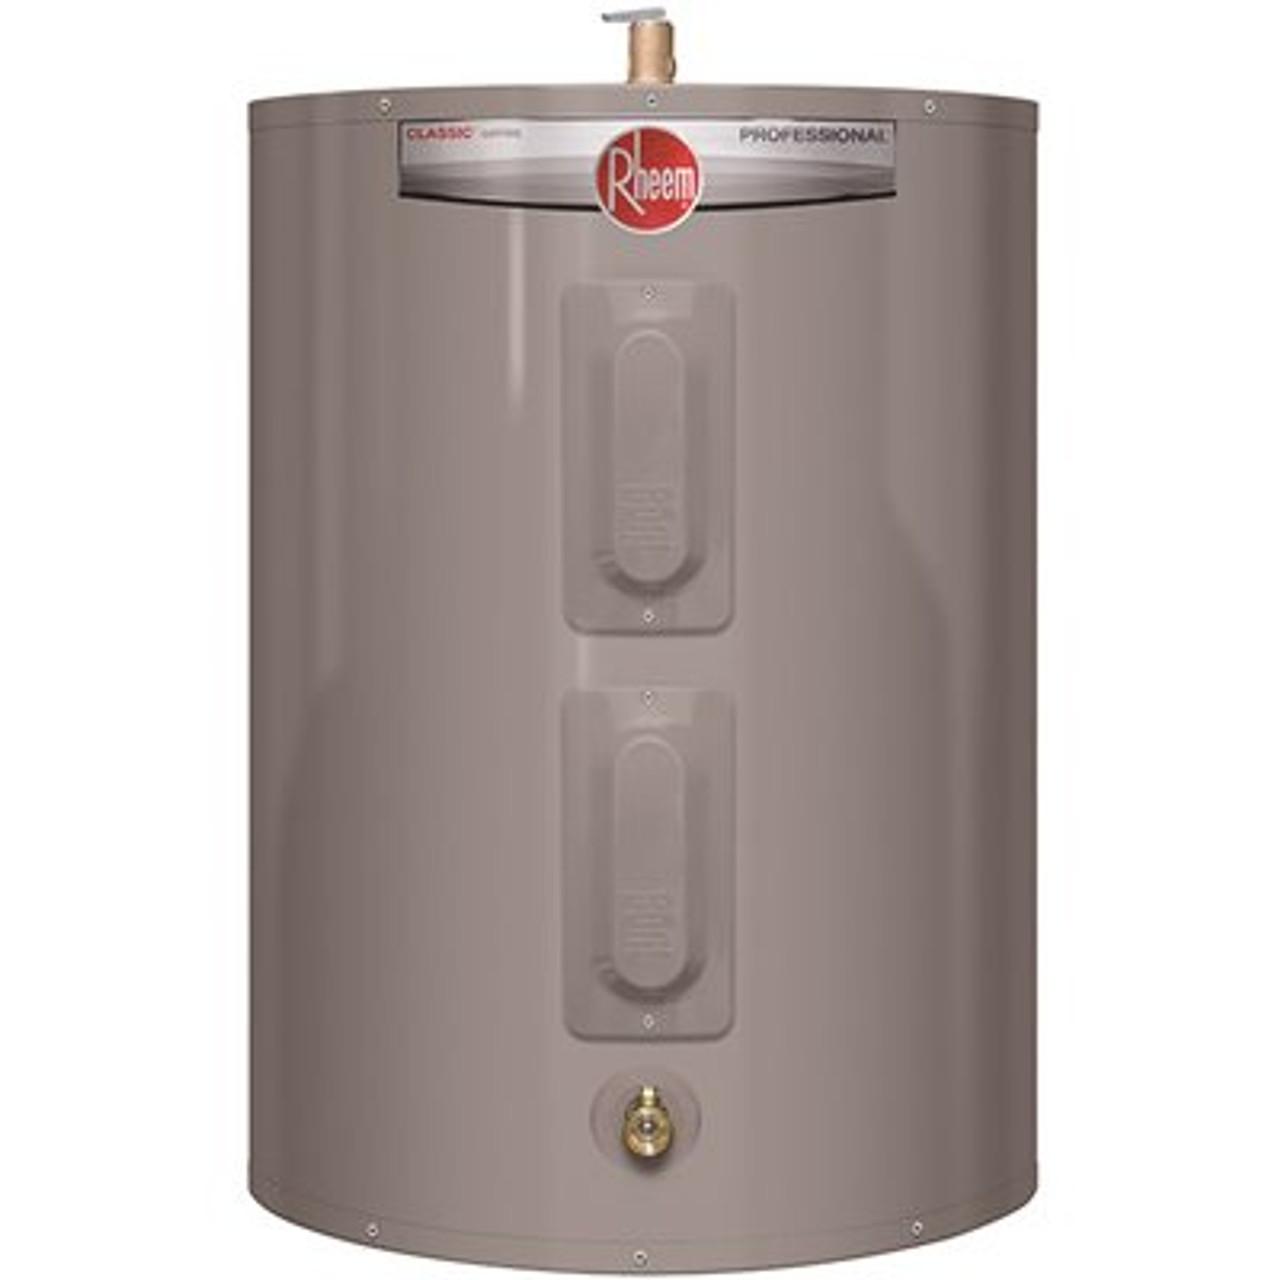 Rheem Professional Classic 47 Gal. 4500-Watt Short Residential Electric Water Heater Item # 3554562|Rheem Part # PROE47 S2 RH95|UPC Code 020352691800